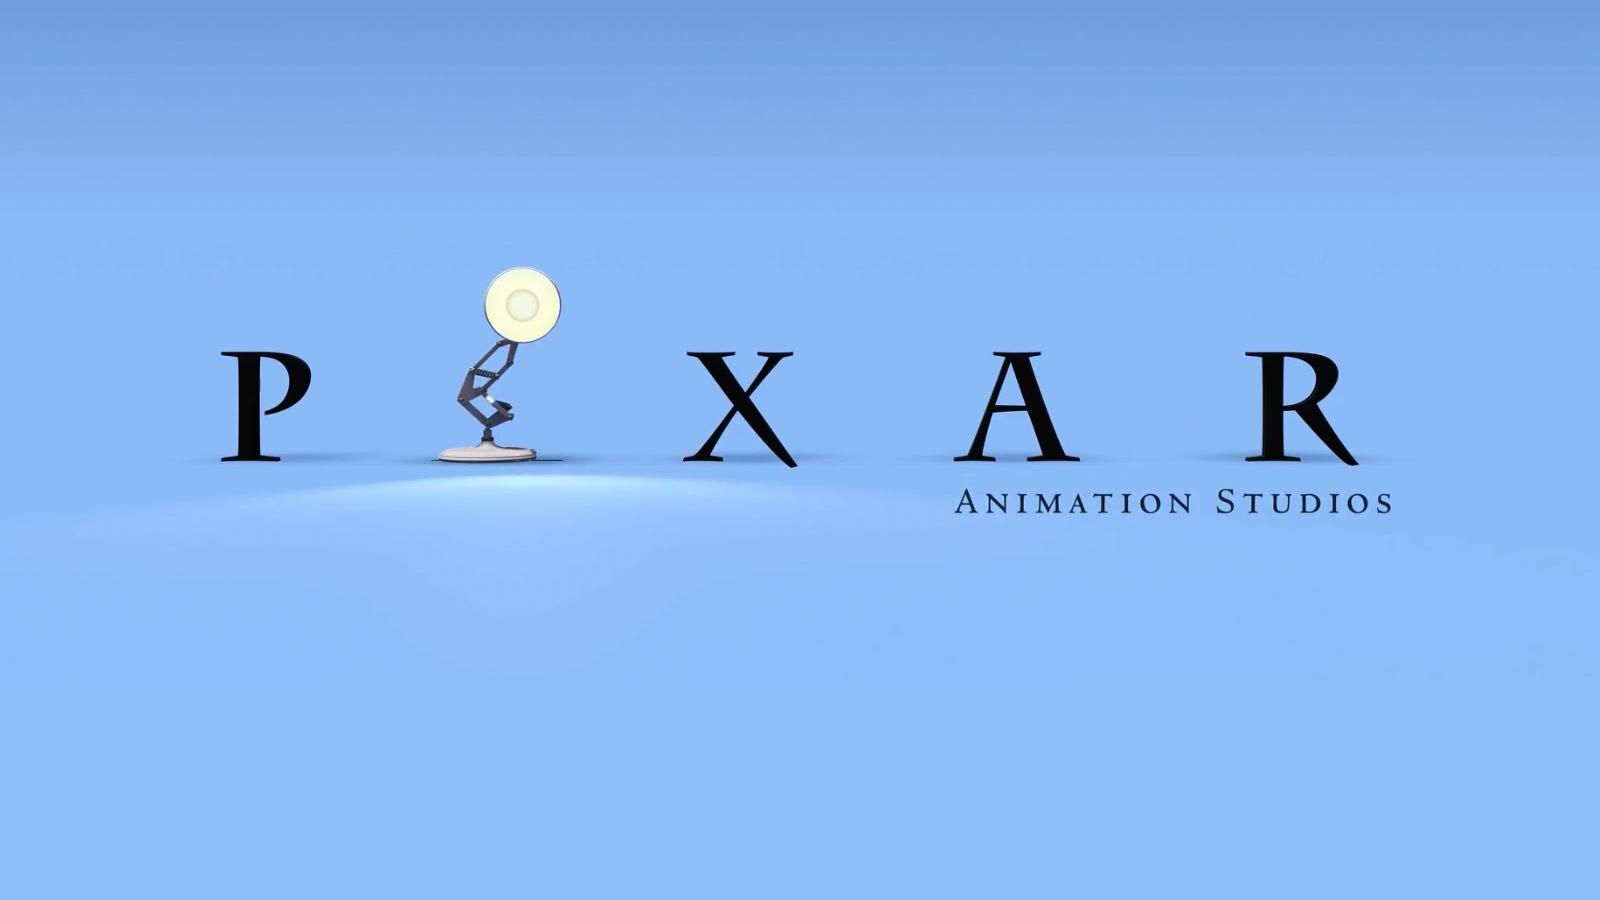 TOP 5 animações Pixar | Cinecom